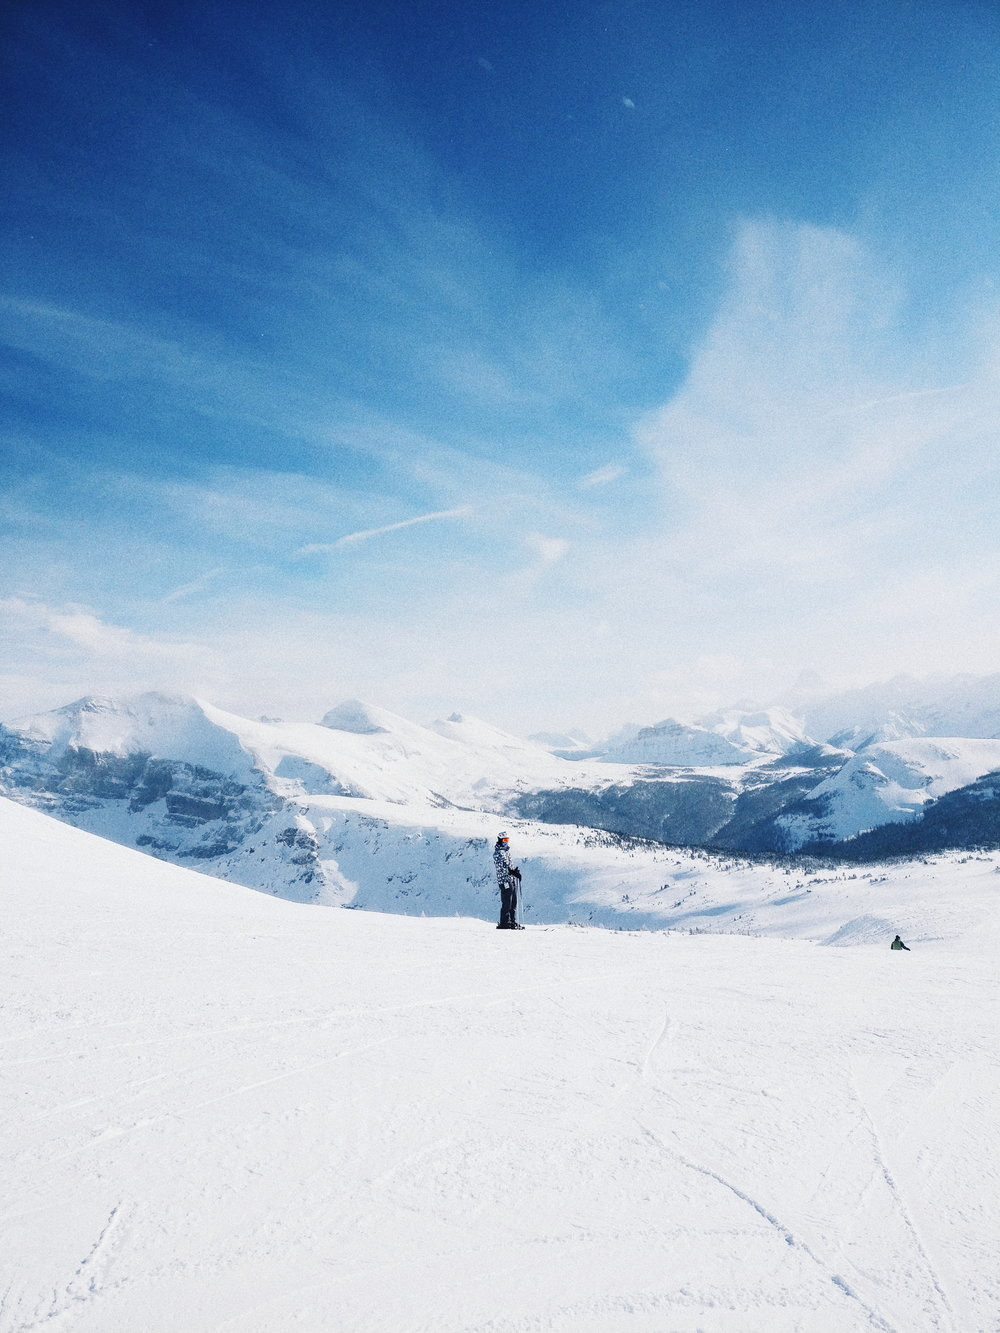 02/21/2018 Dylan Moore, Sunshine Ski Resort, Banff, Alberta